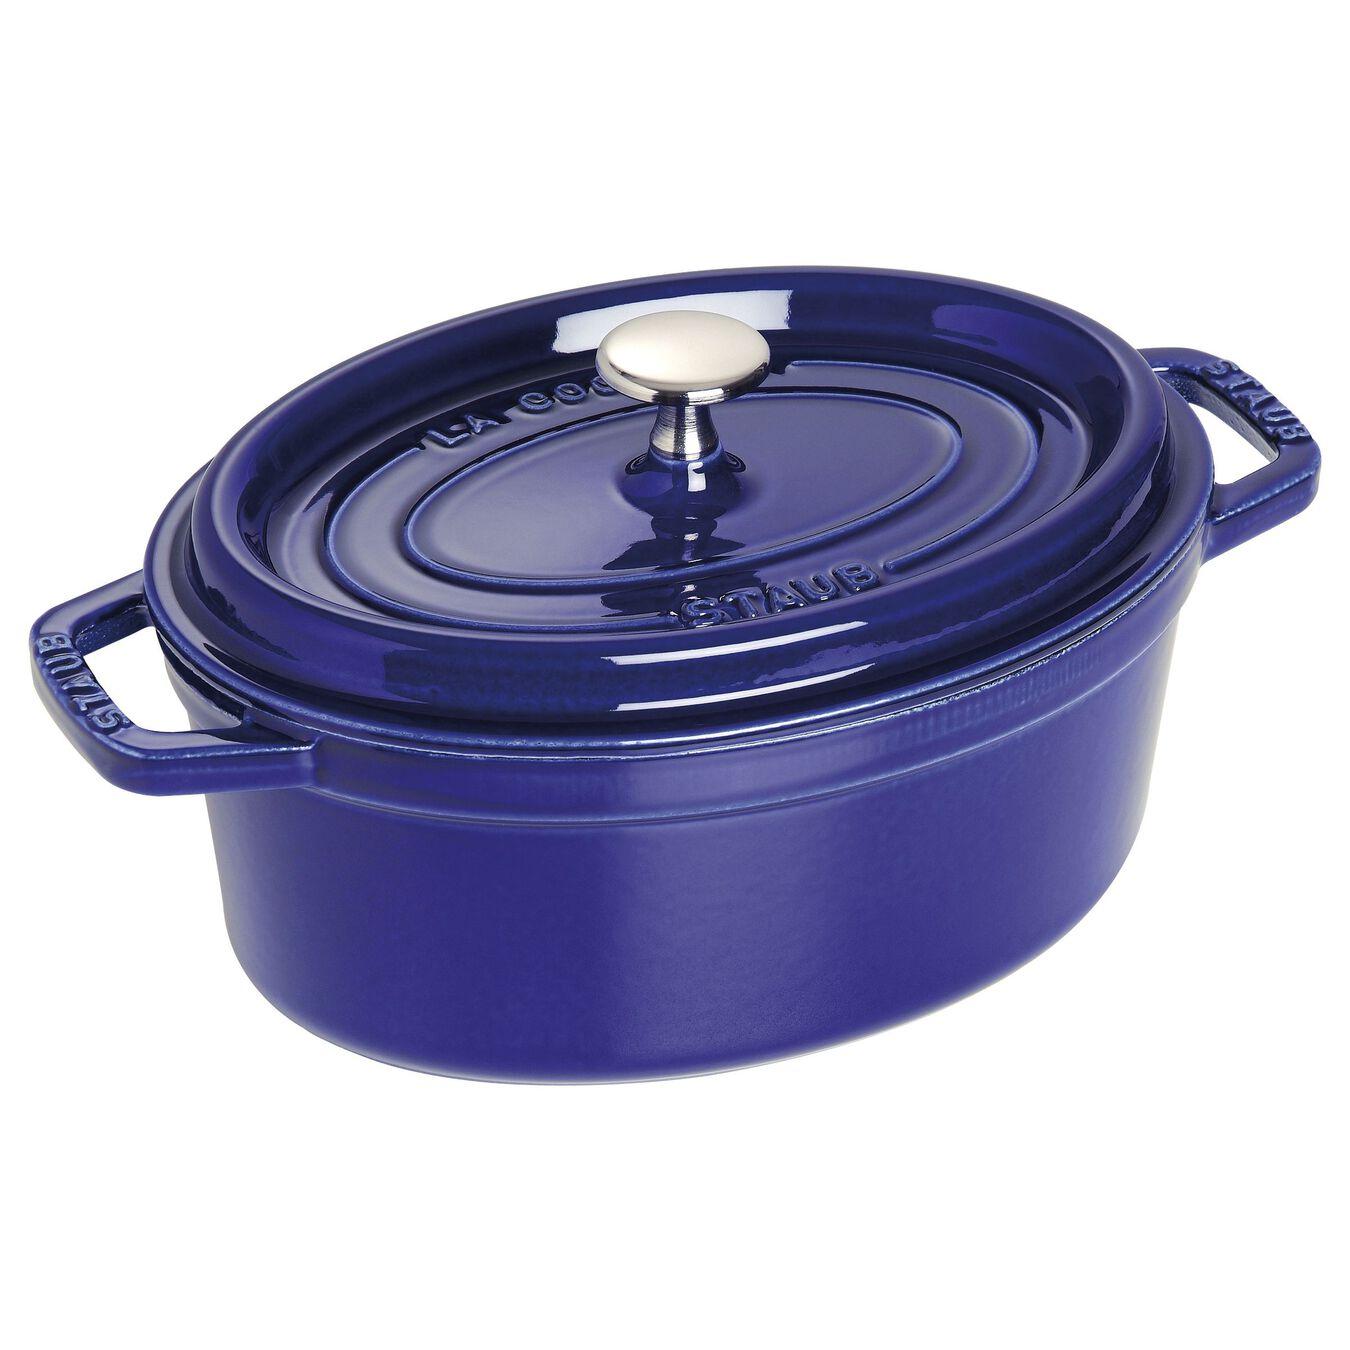 Caçarola 23 cm, oval, azul marinho, Ferro fundido,,large 1